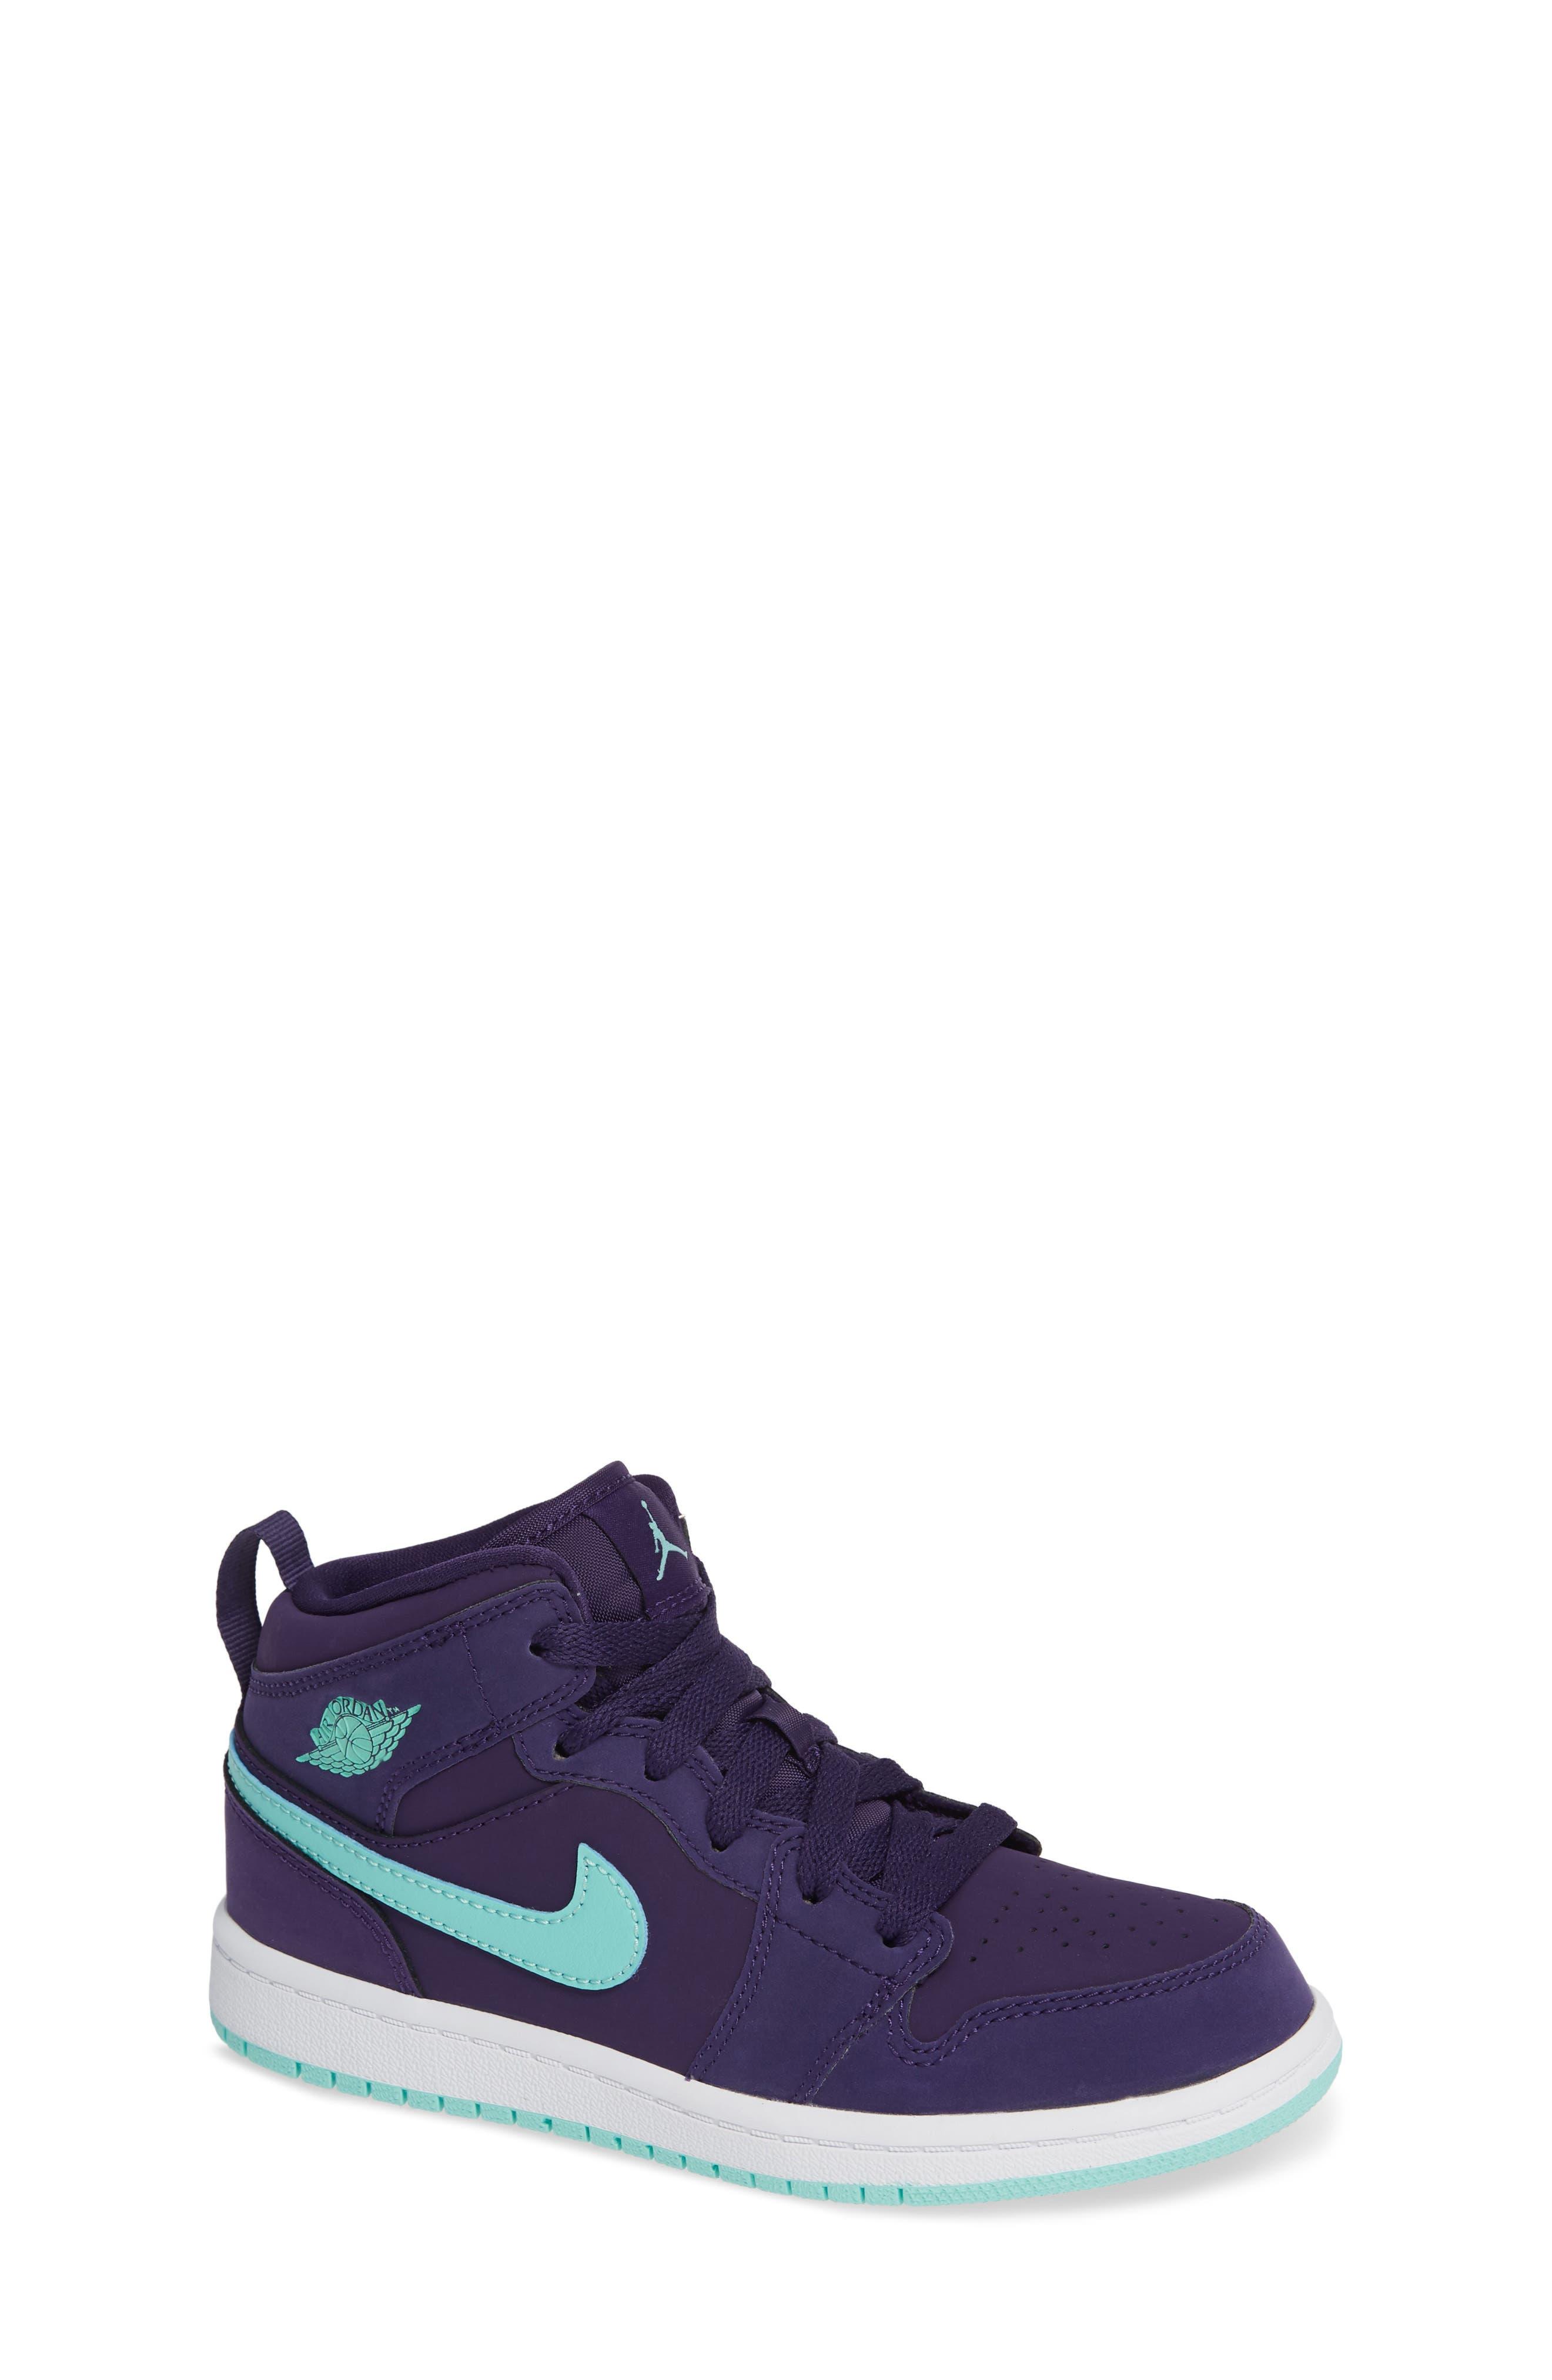 Nike 'Jordan 1 Mid' Basketball Shoe,                             Main thumbnail 1, color,                             INK/ EMERALD RISE/ WHITE